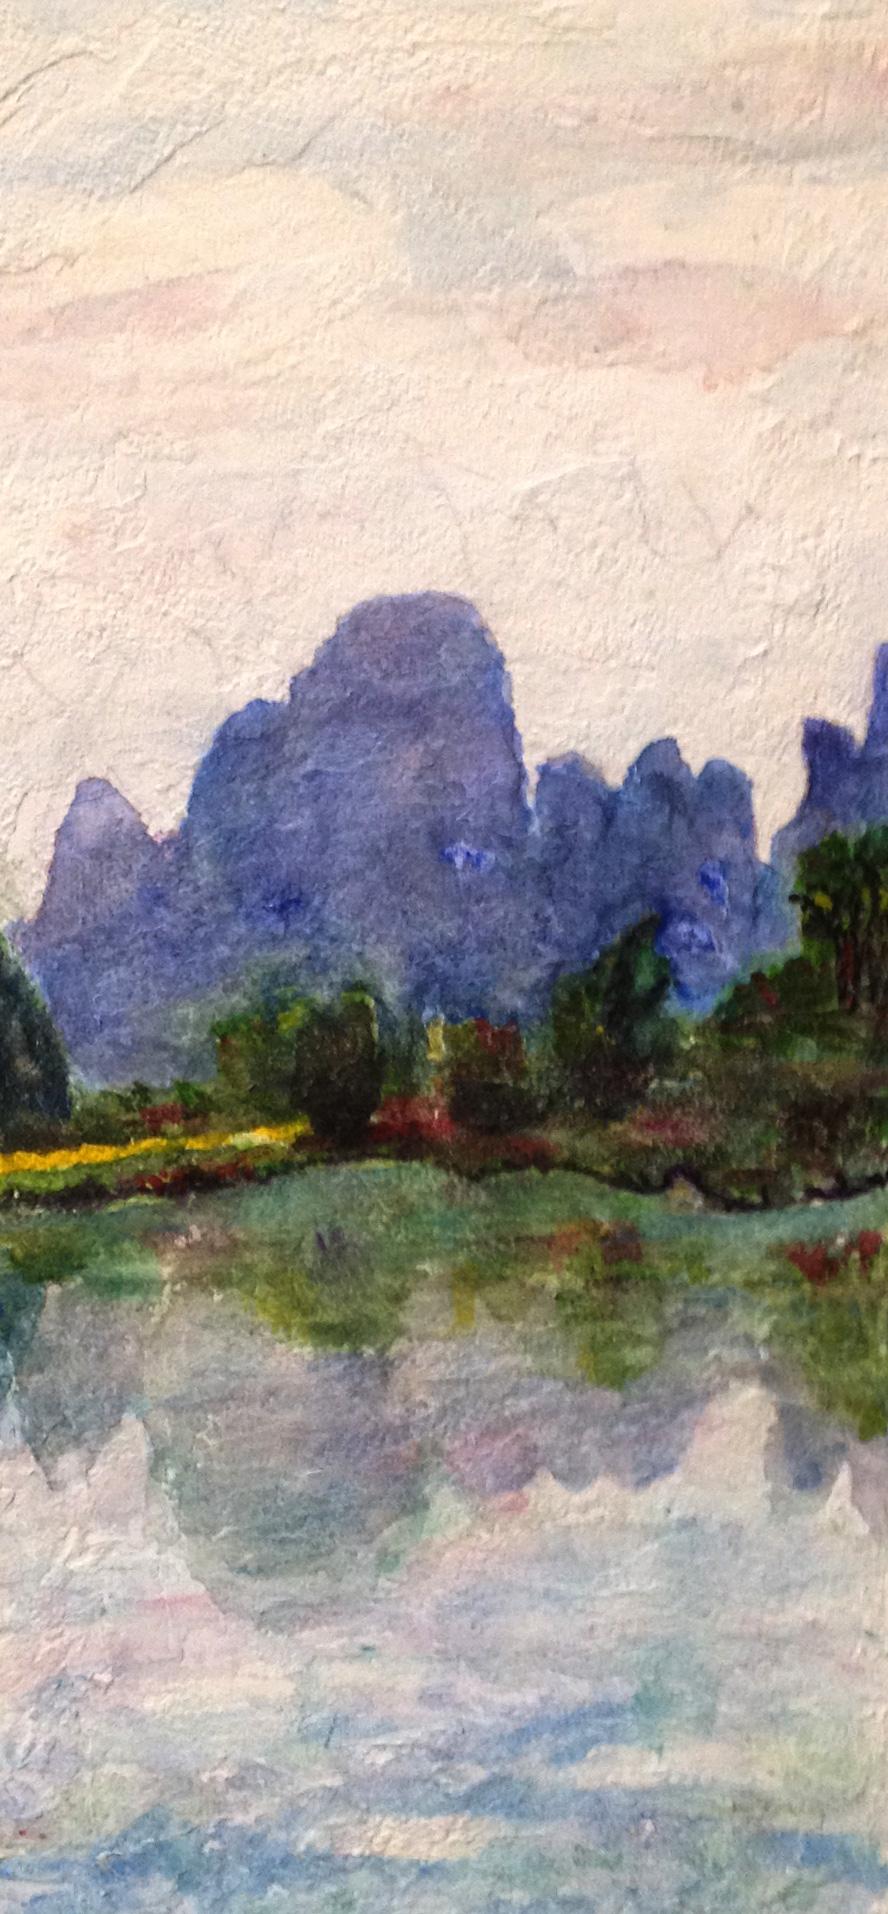 China Landscape - Watercolor